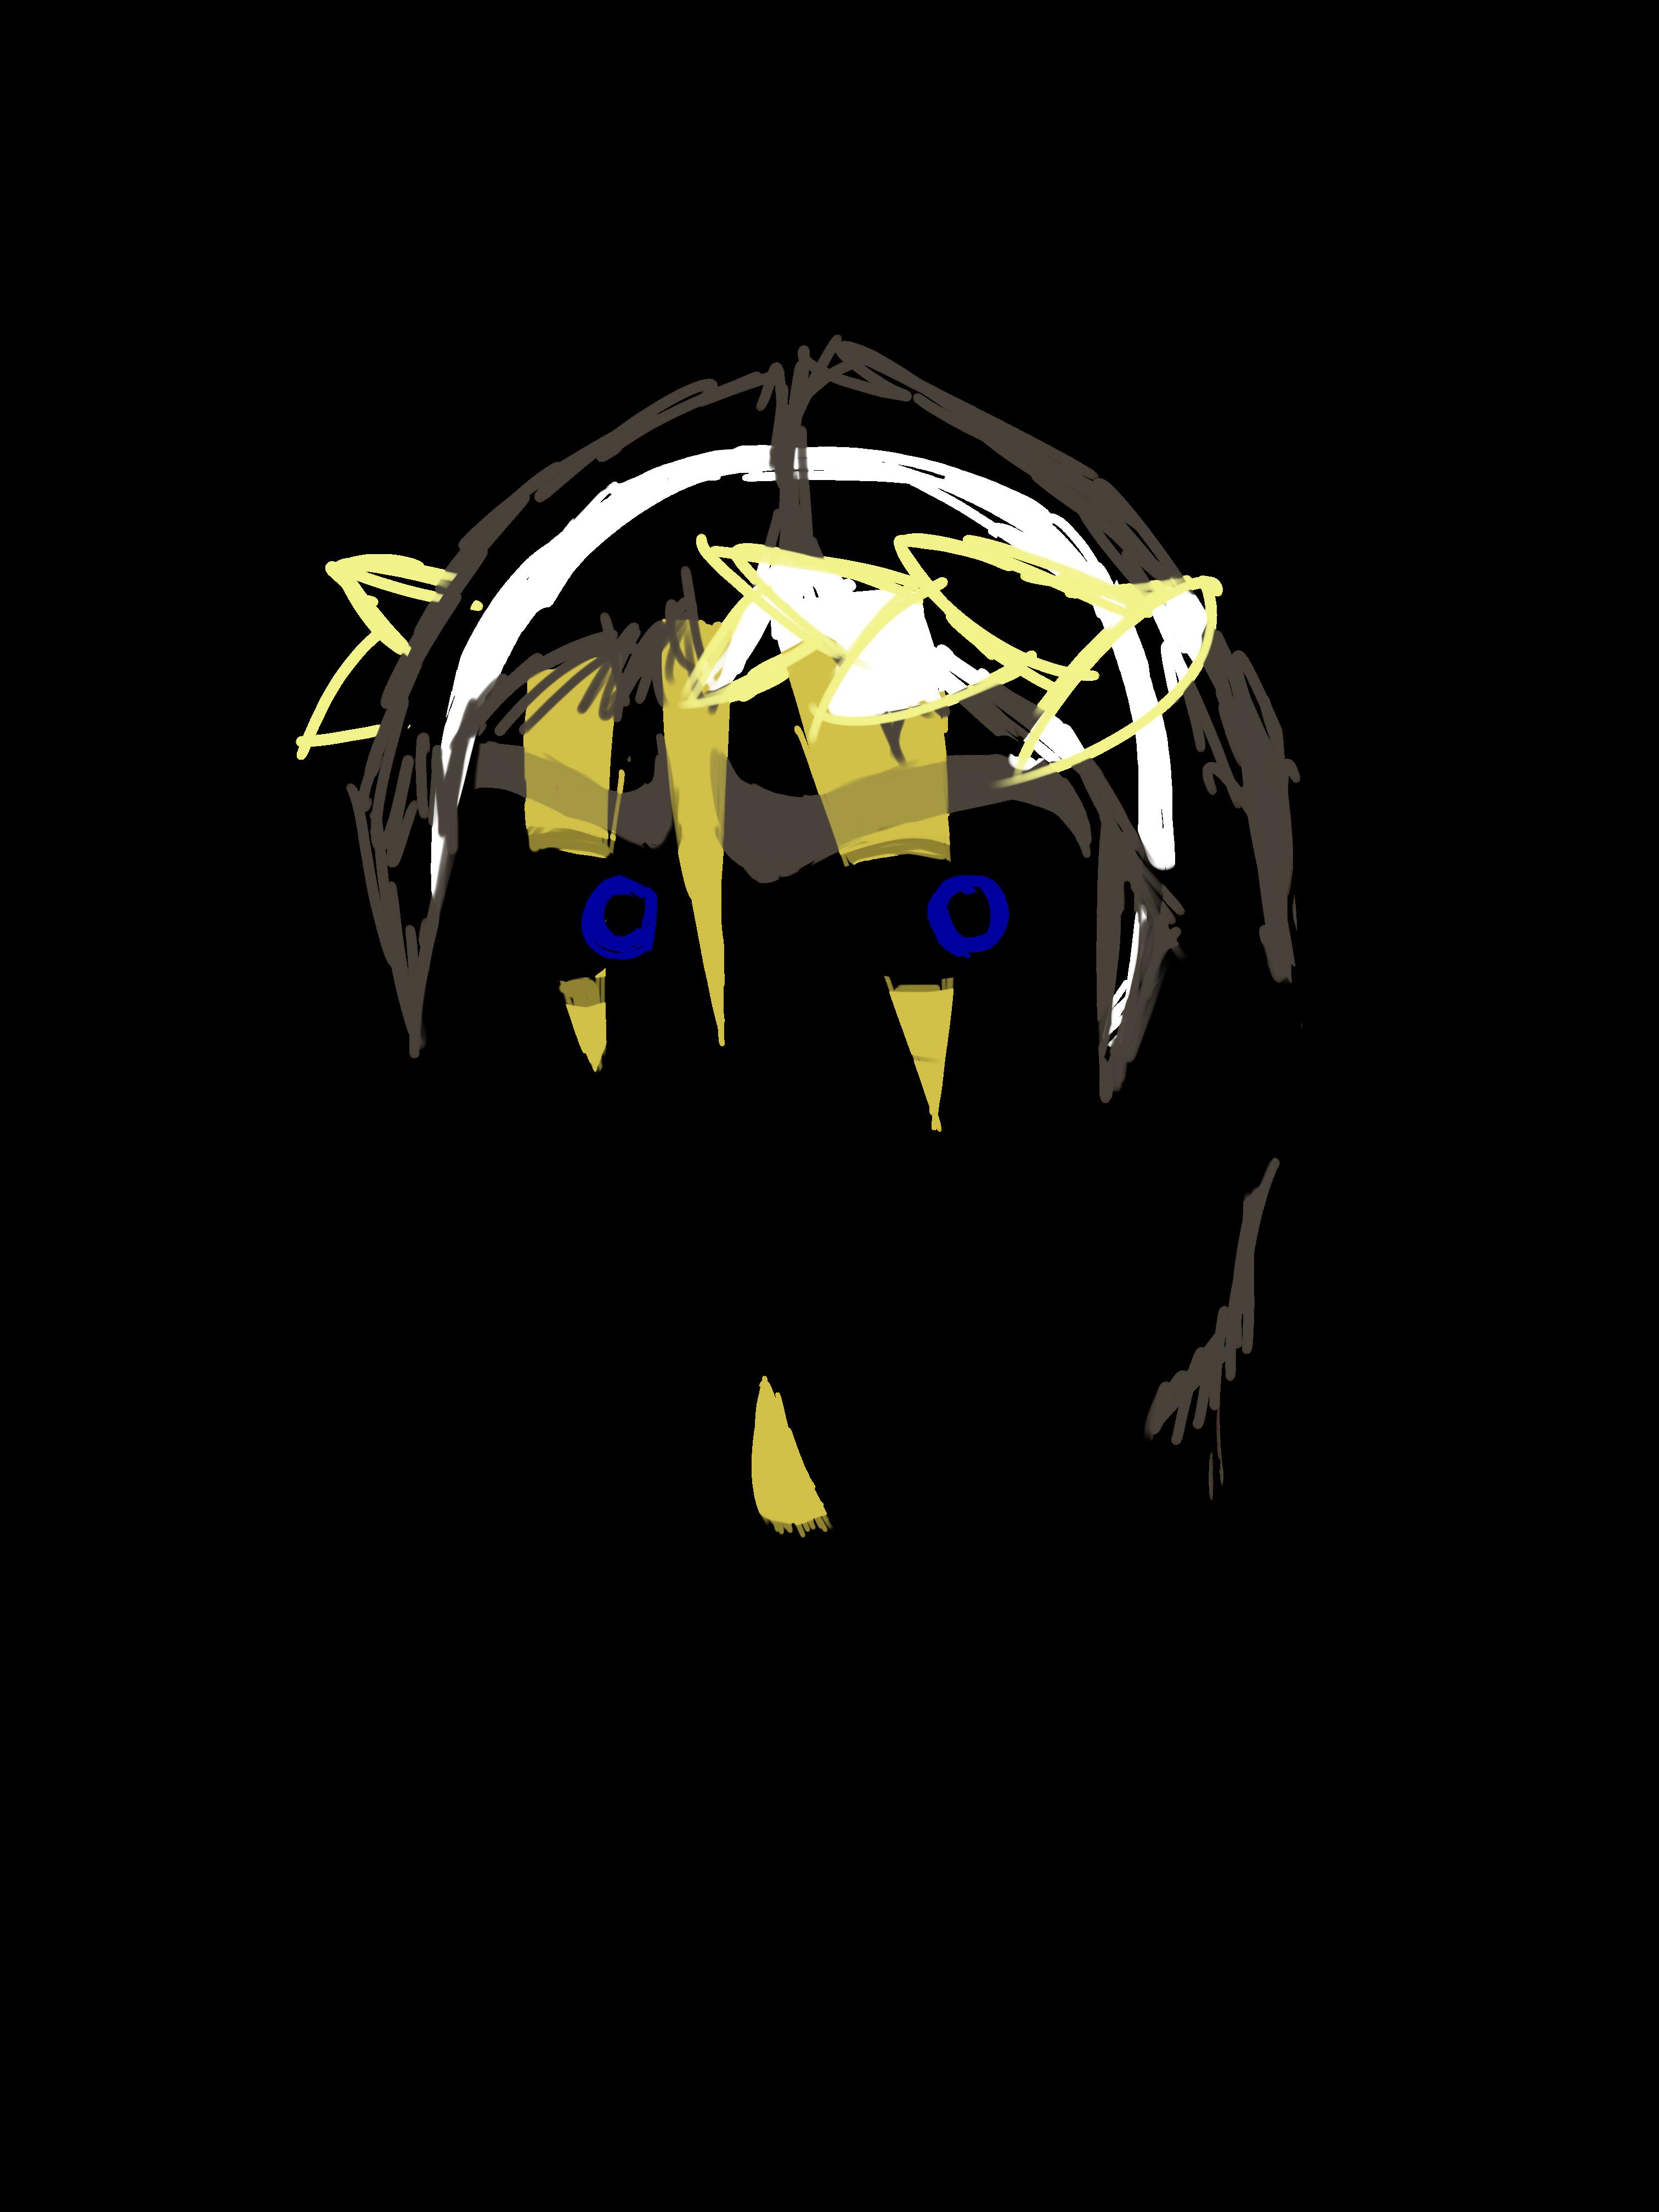 God Of War Iii Helios By Futs Lung 09 On Deviantart